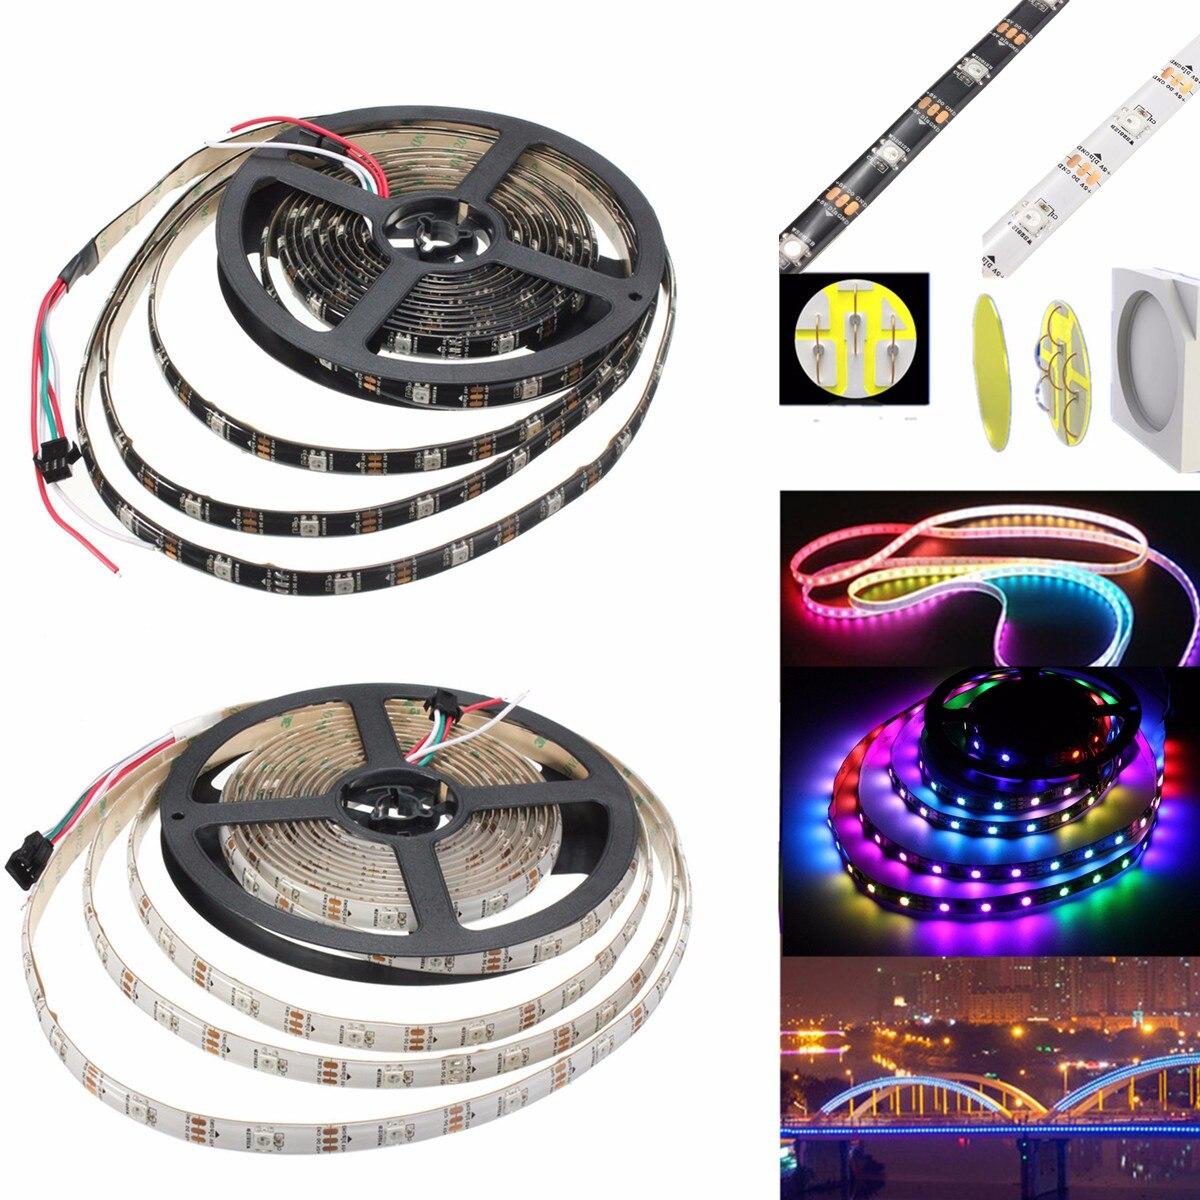 RGB LED Flexible Strip Light 5M 45W 150SMD WS2812B Waterproof IP65 Fairy Christmas Trees Party home lighting